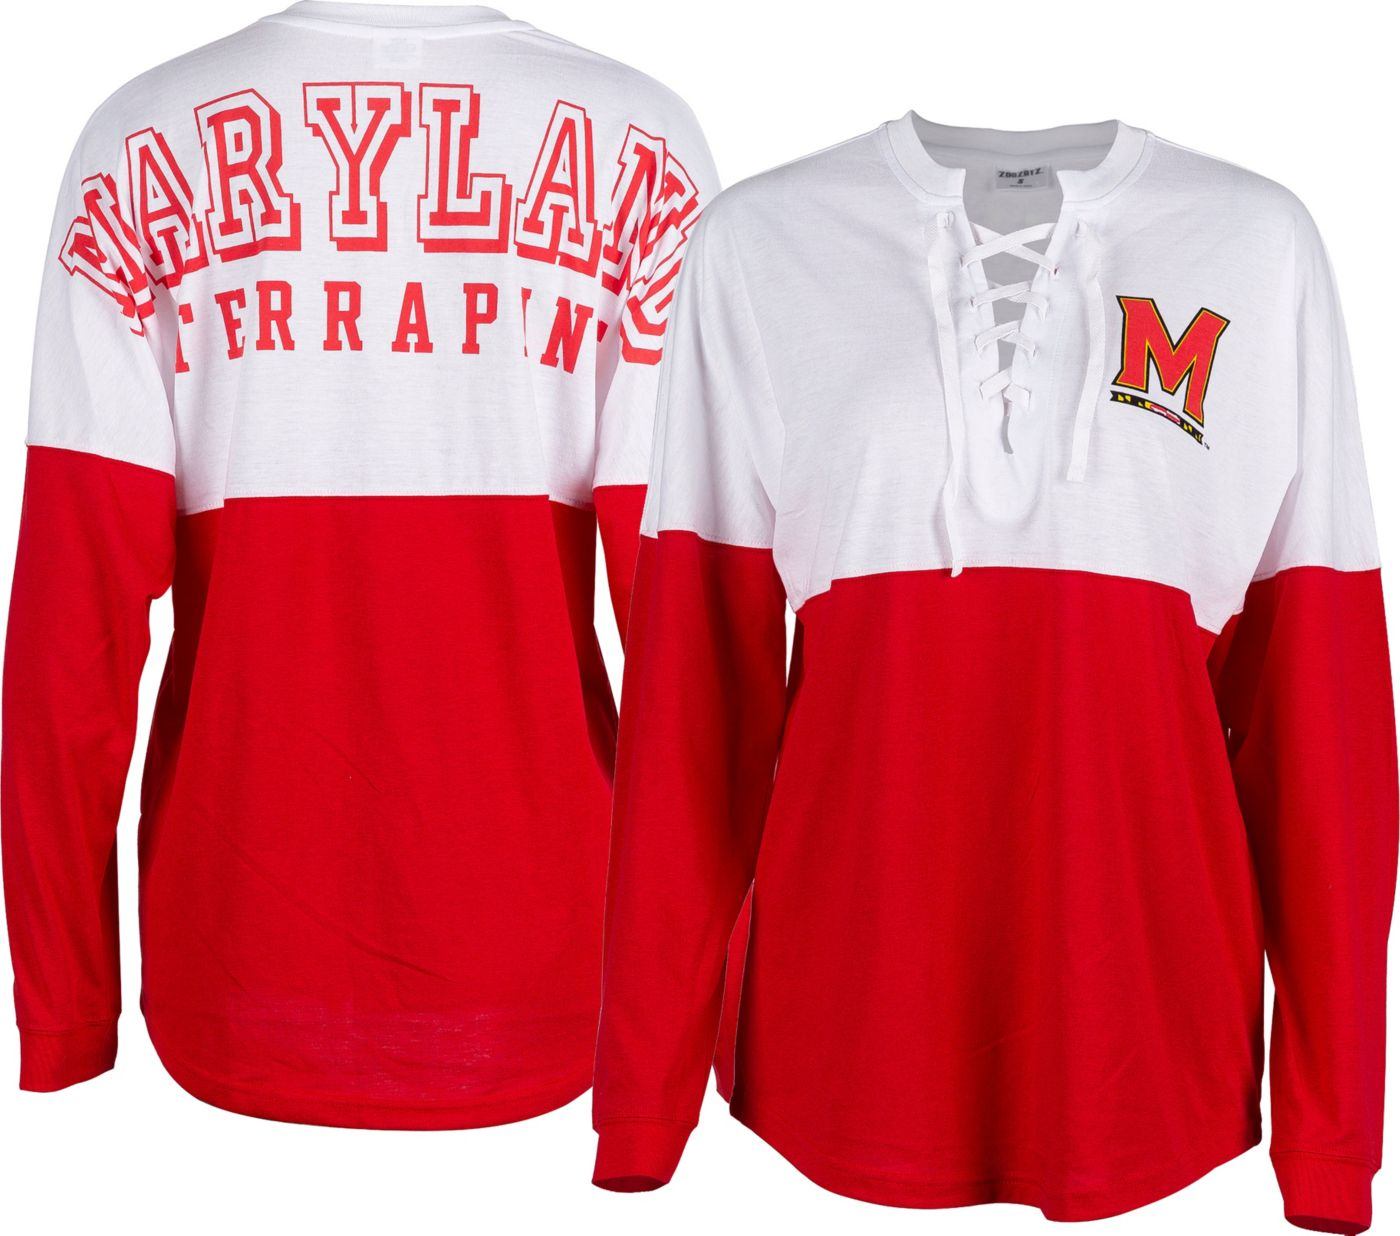 ZooZatz Women's Maryland Terrapins Red Clearblock Long Sleeve T-Shirt